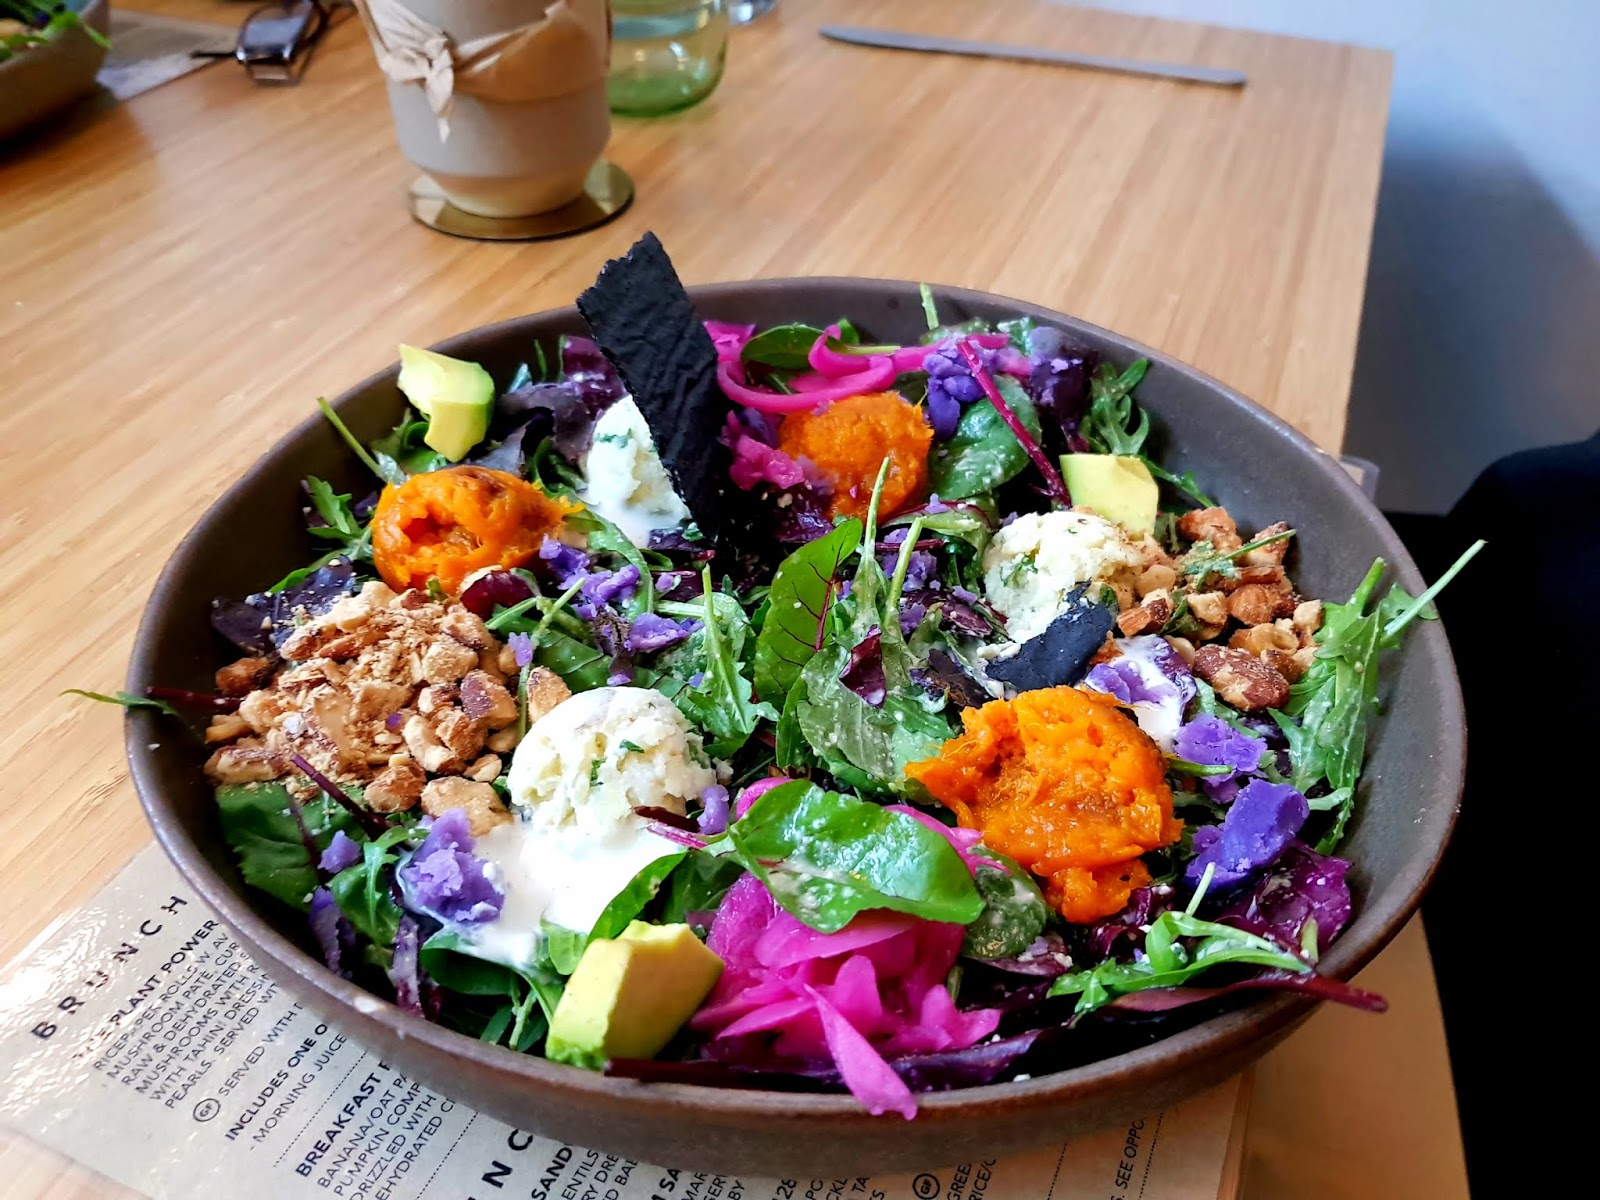 Plant Power Food - Best vegan restaurants in Copenhagen - Things to do in Copenhagen - Solo Copenhagen Guide